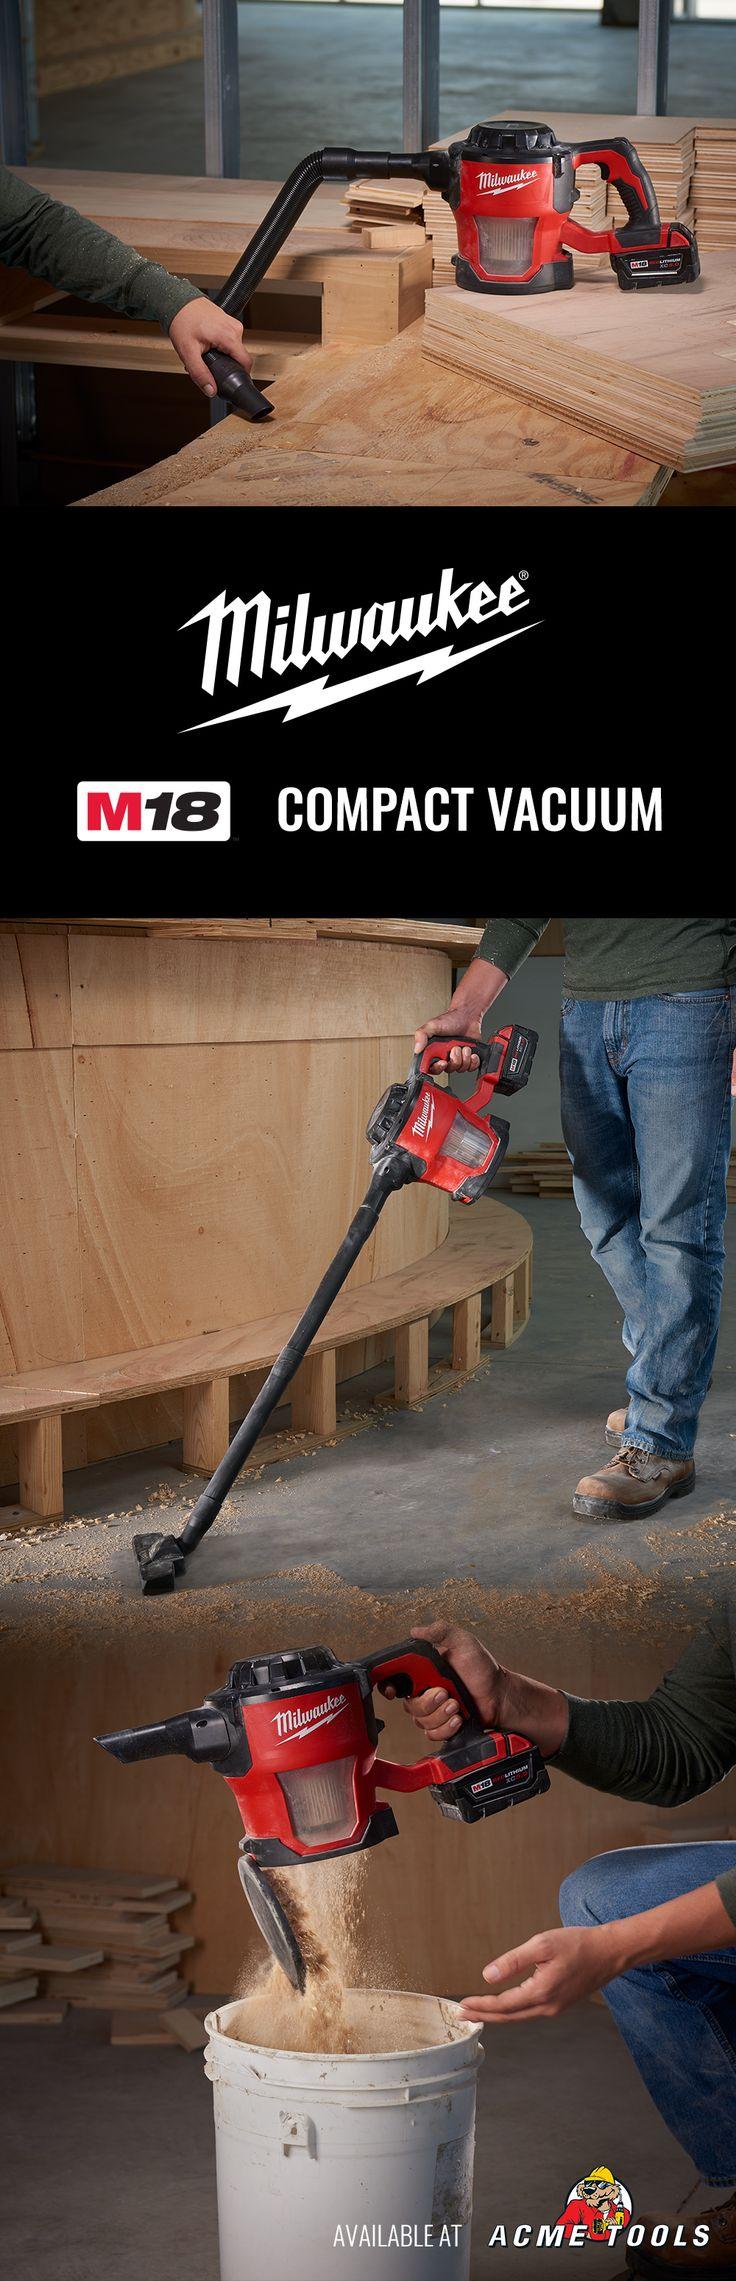 Get Milwaukee's M18 Cordless, Handheld Vacuum at Acme Tools.